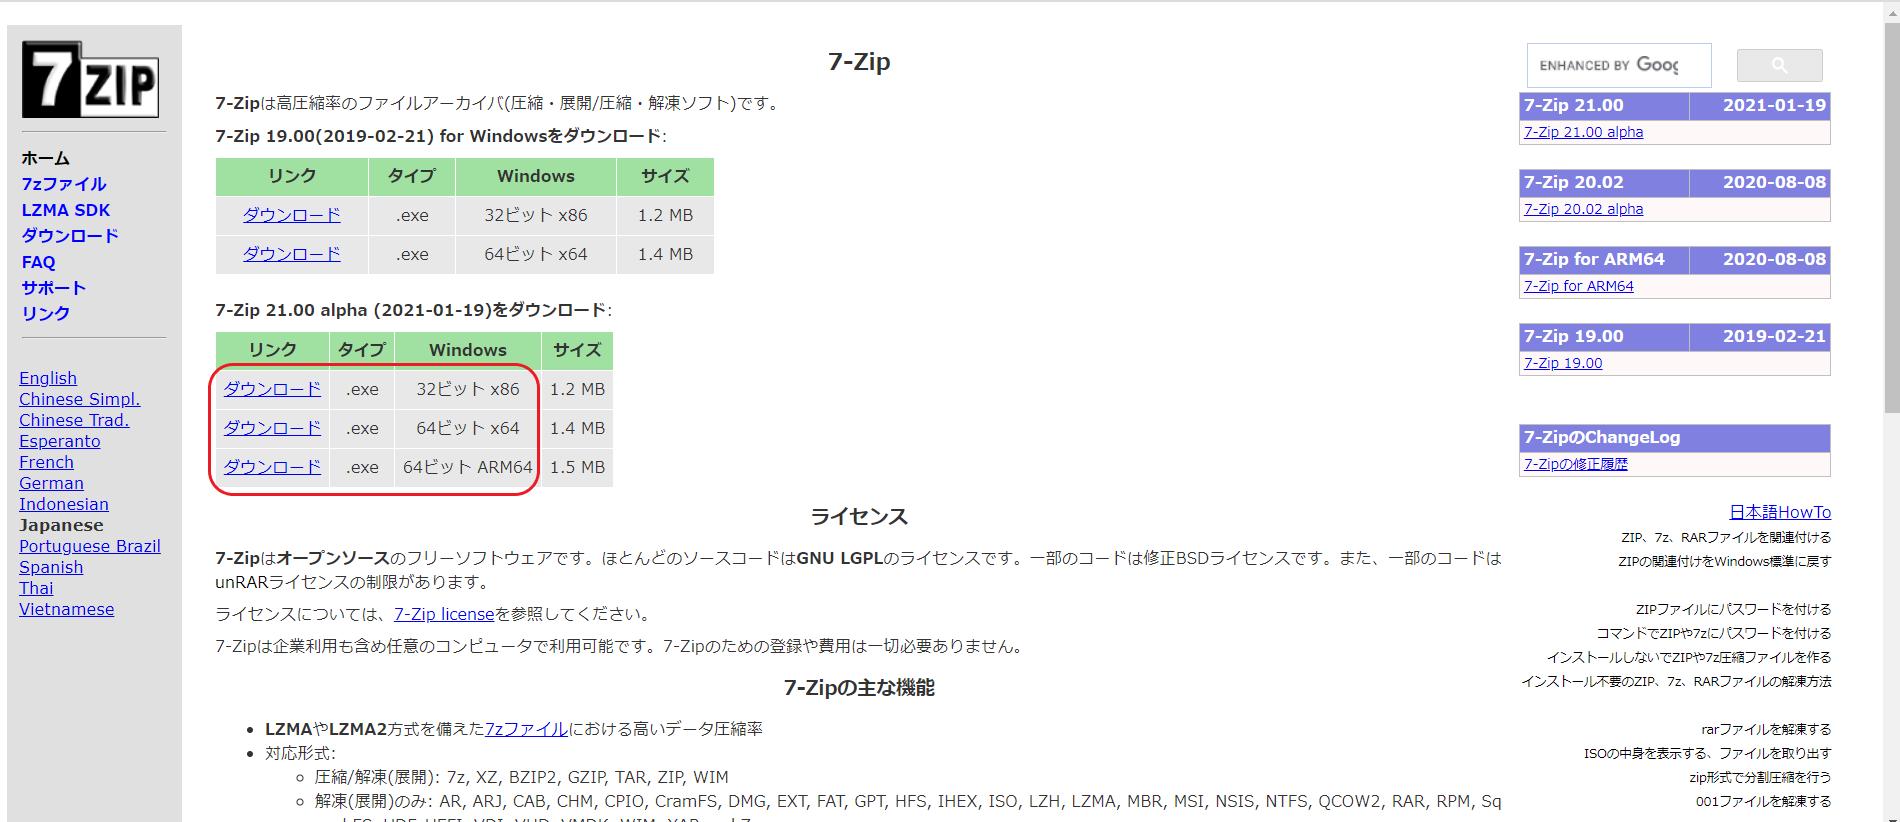 7-Zip ダウンロードリンク